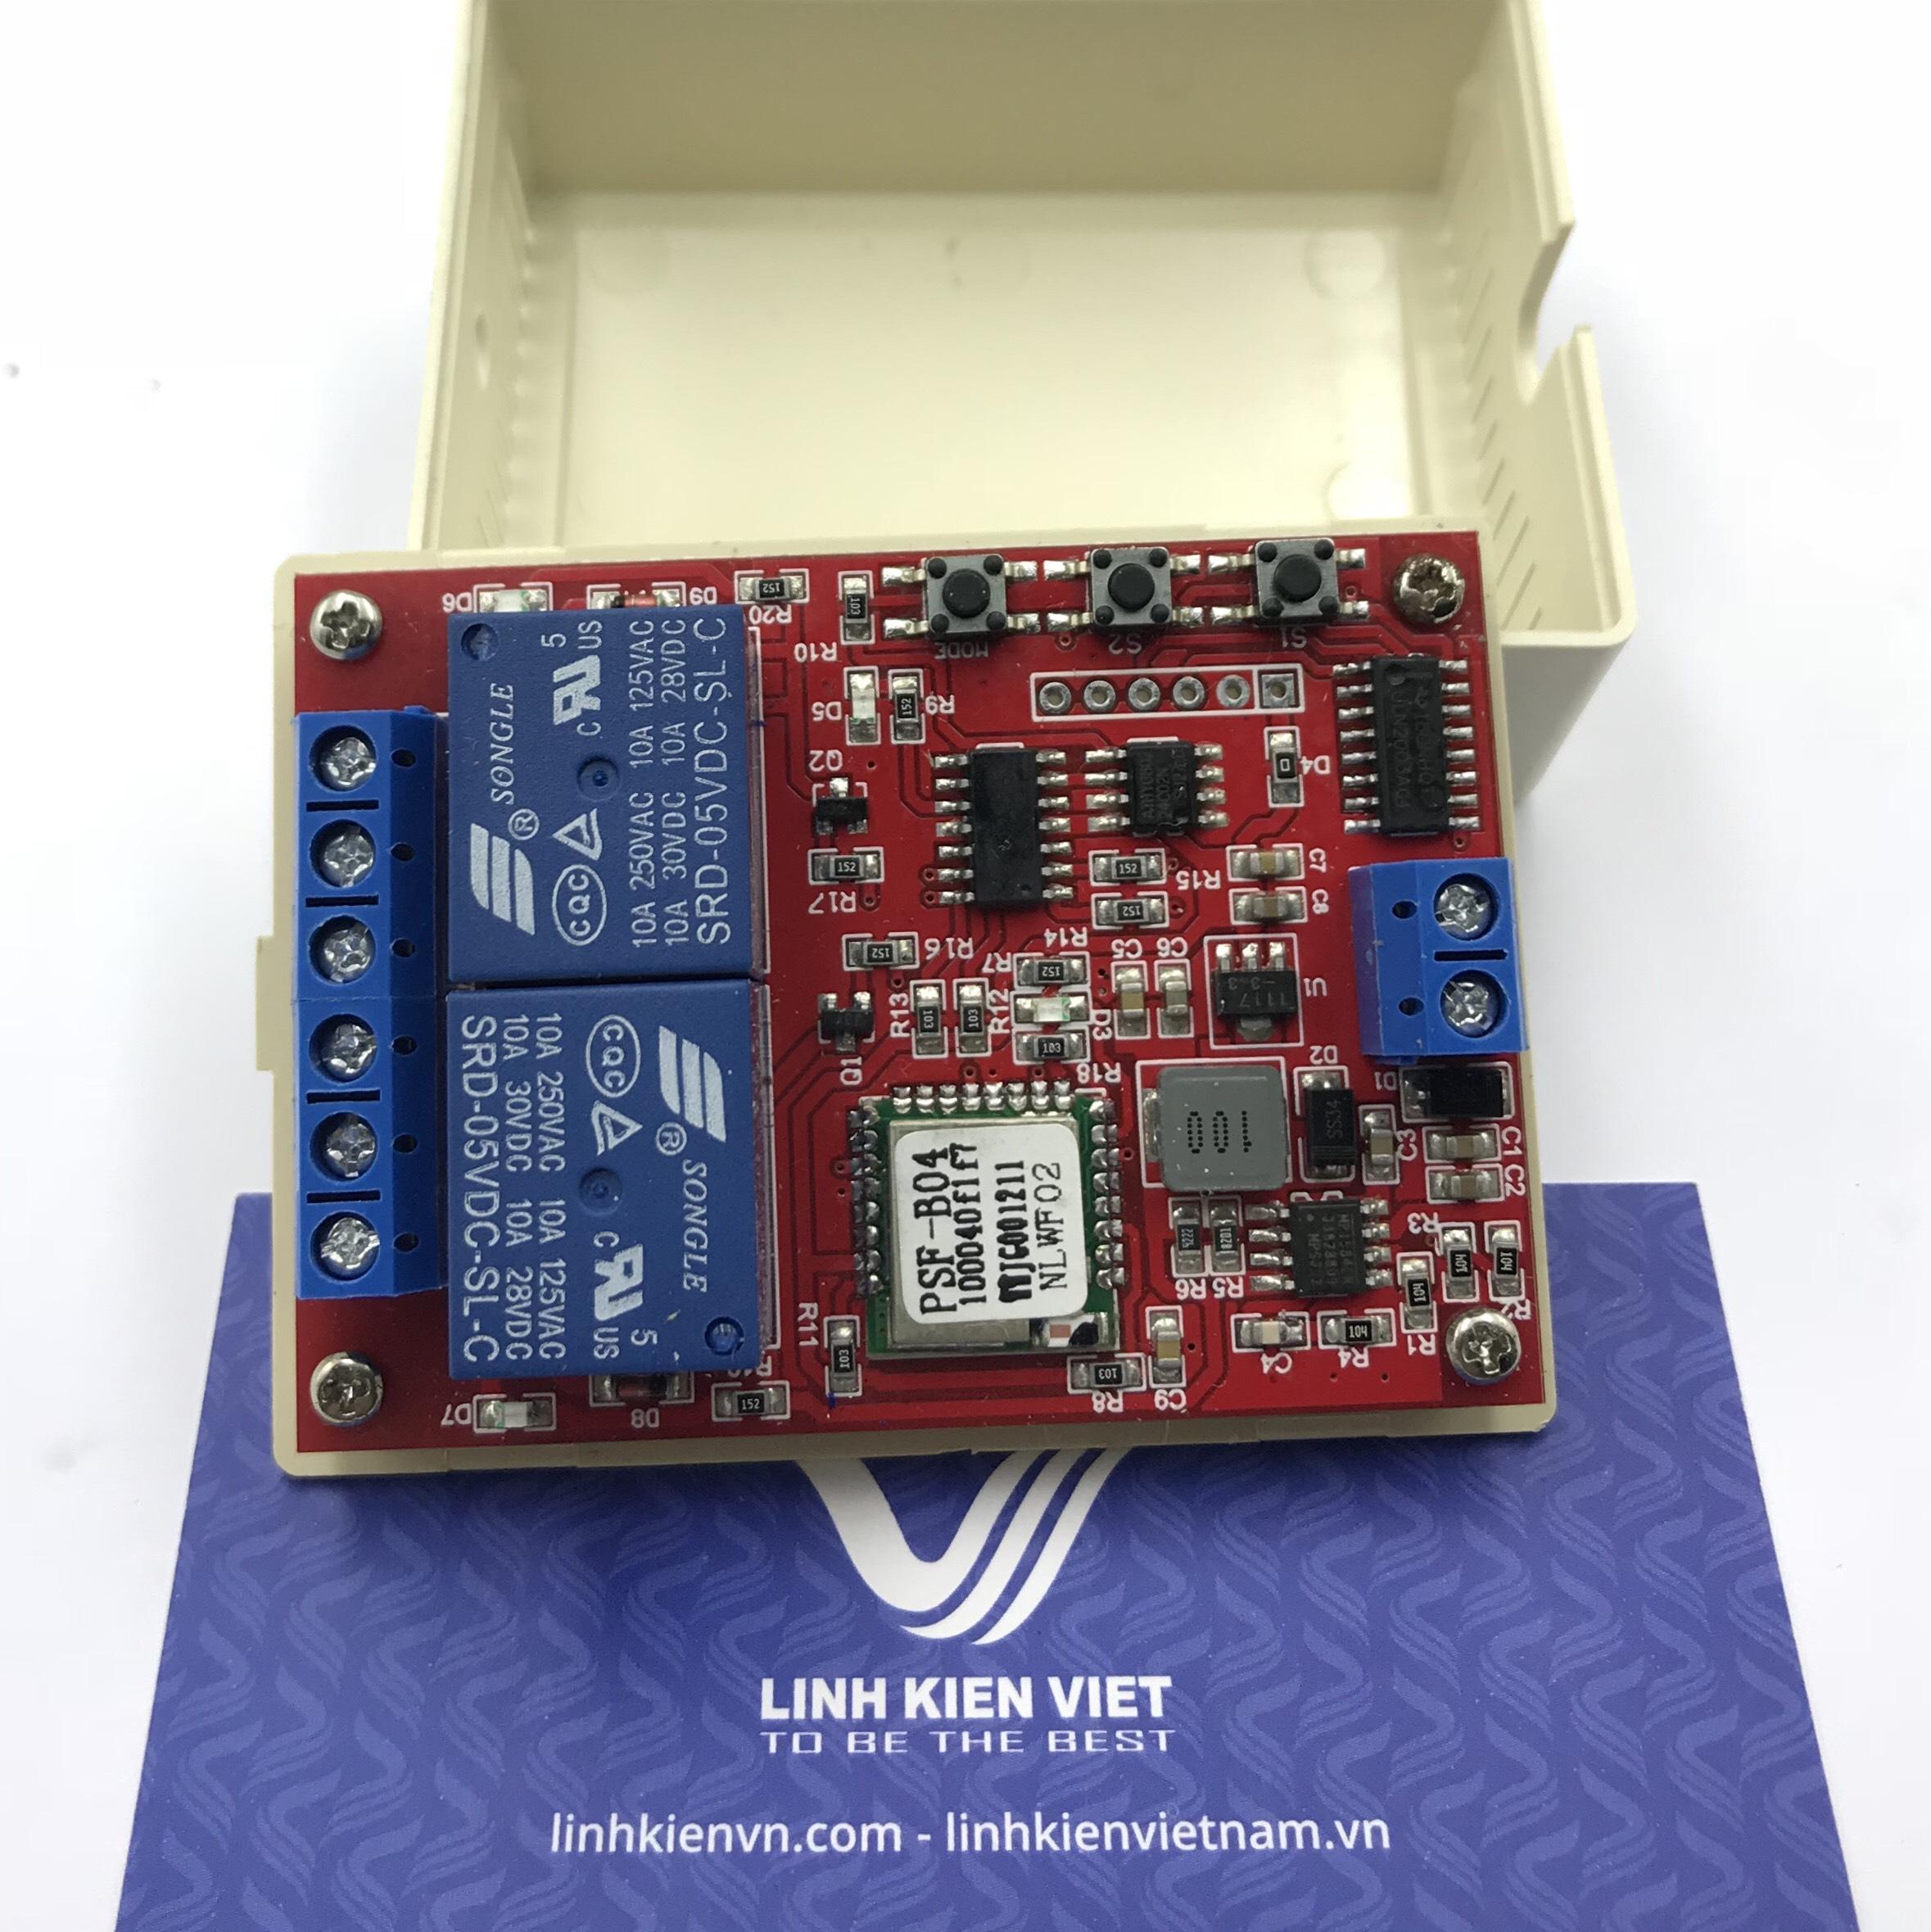 Module relay Wifi 2 kênh 12VDC - phần mềm Ewelink  / Điều khiển thiết bị qua wifi 2 kênh